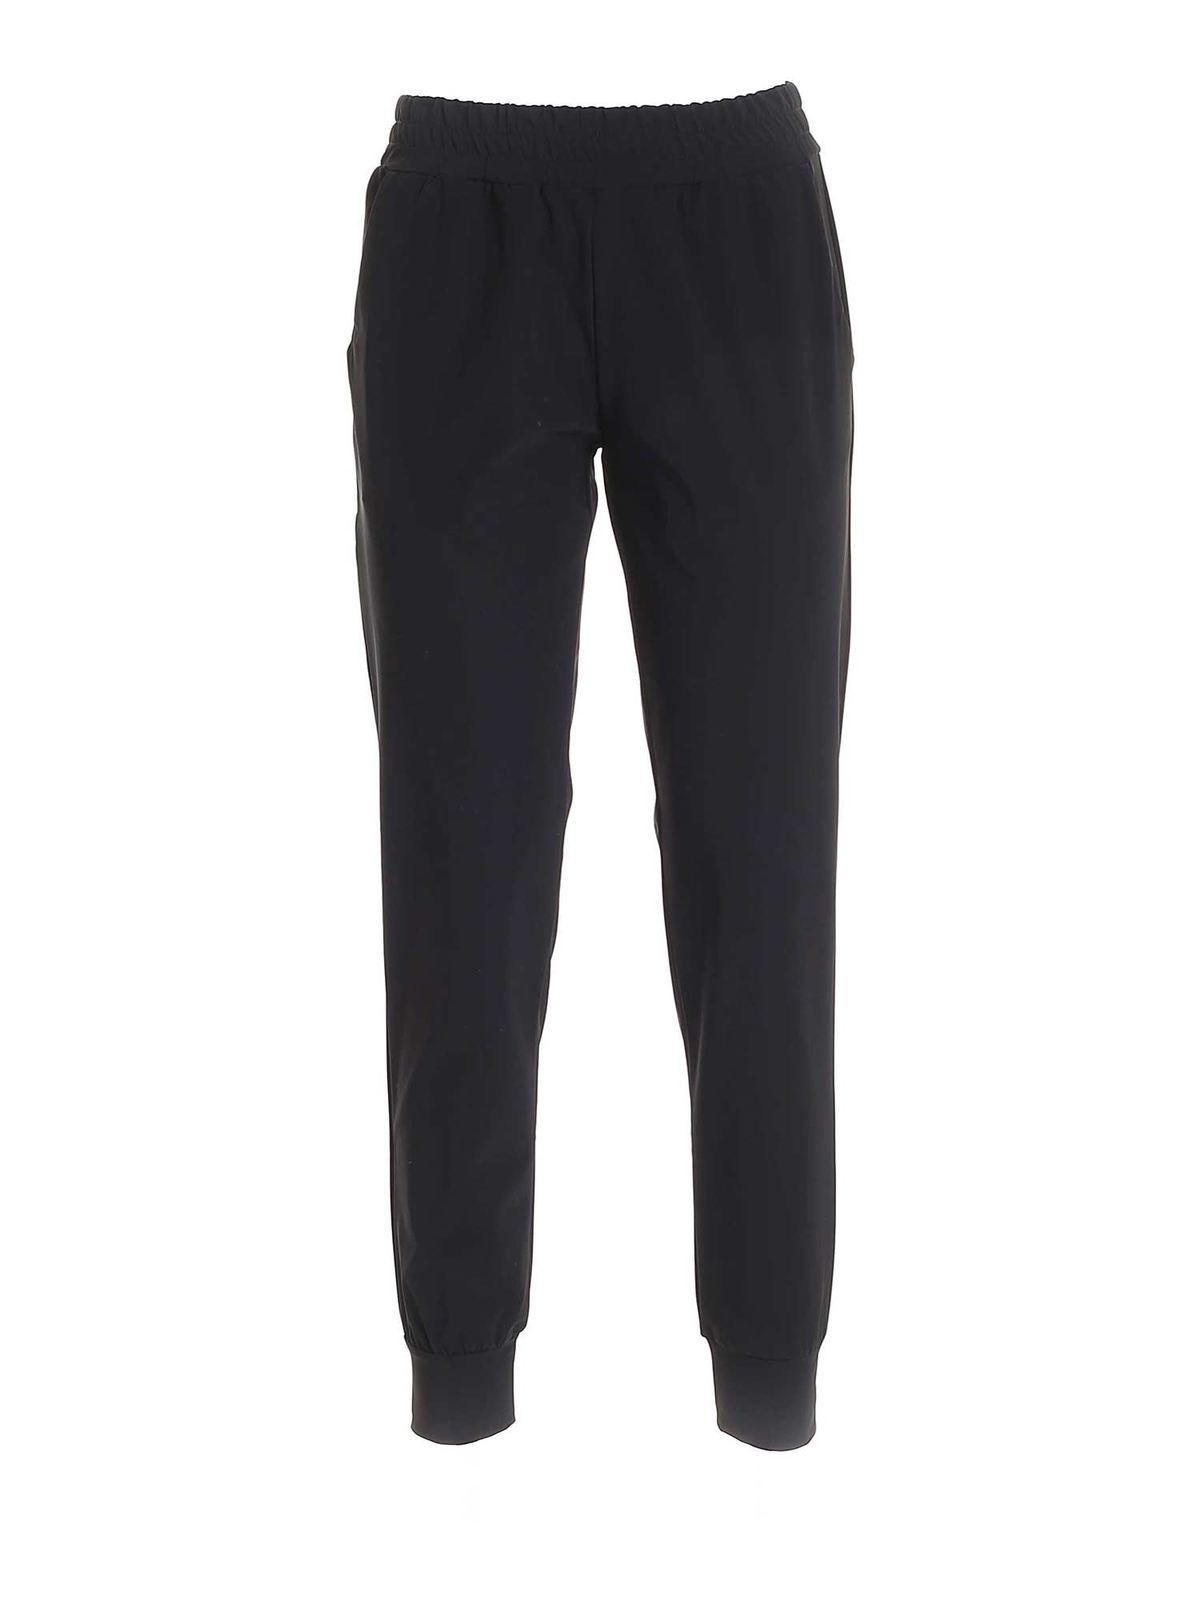 Rrd Roberto Ricci Designs Elasticated Waist Pants In Black